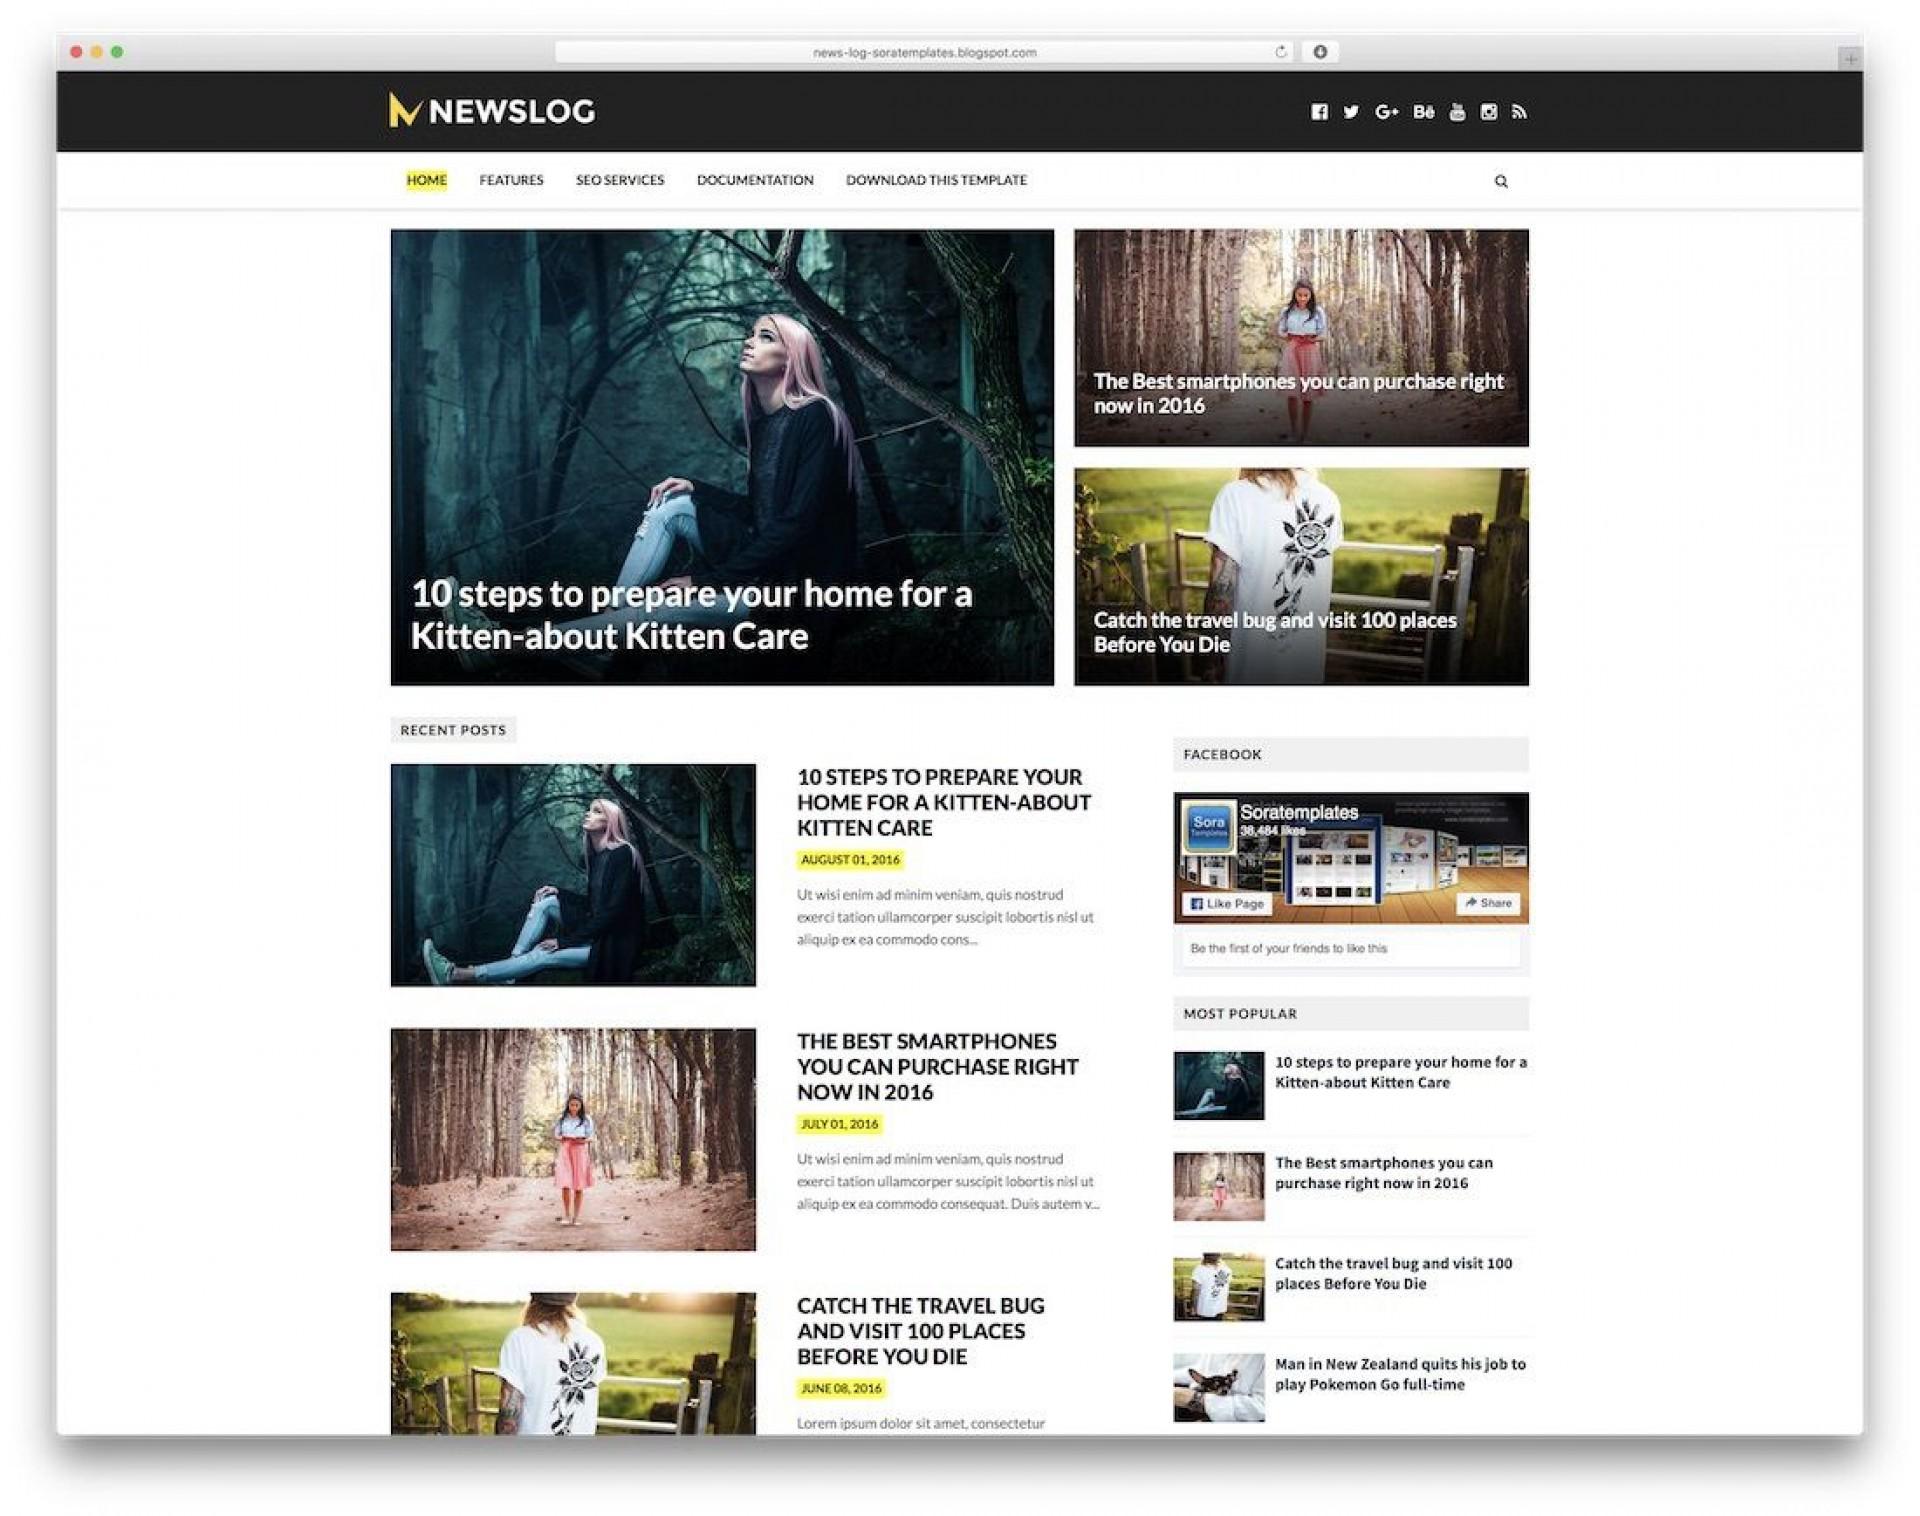 006 Singular Download Free Responsive Blogger Template High Def  Galaxymag - New & Magazine Newspaper Video1920